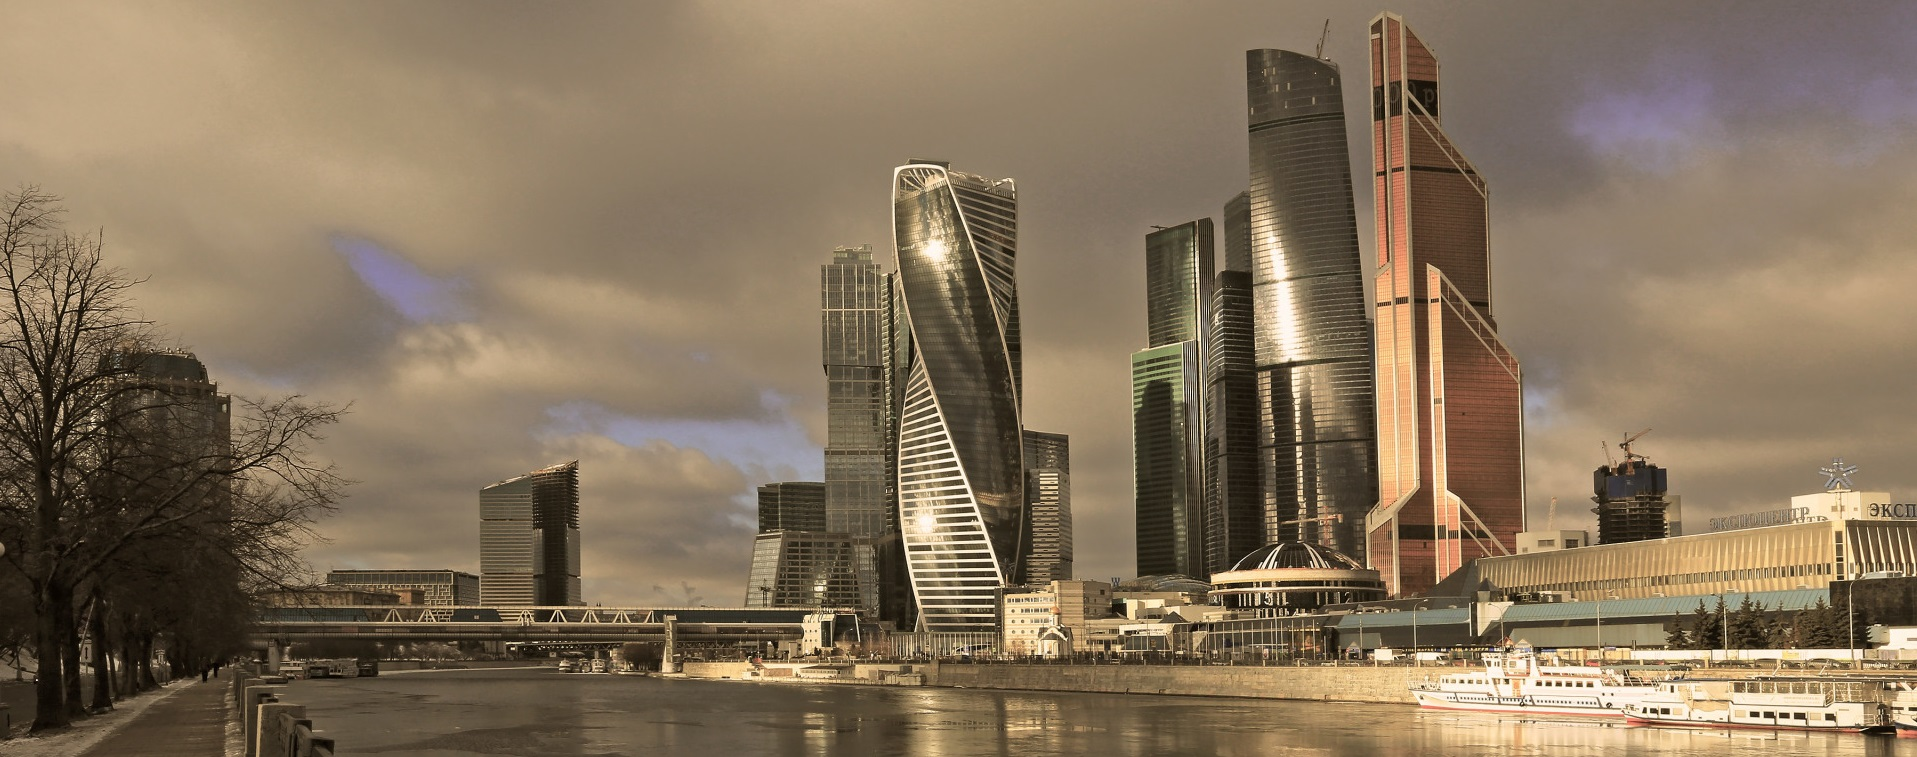 Грузоперевозки по Москве дешево